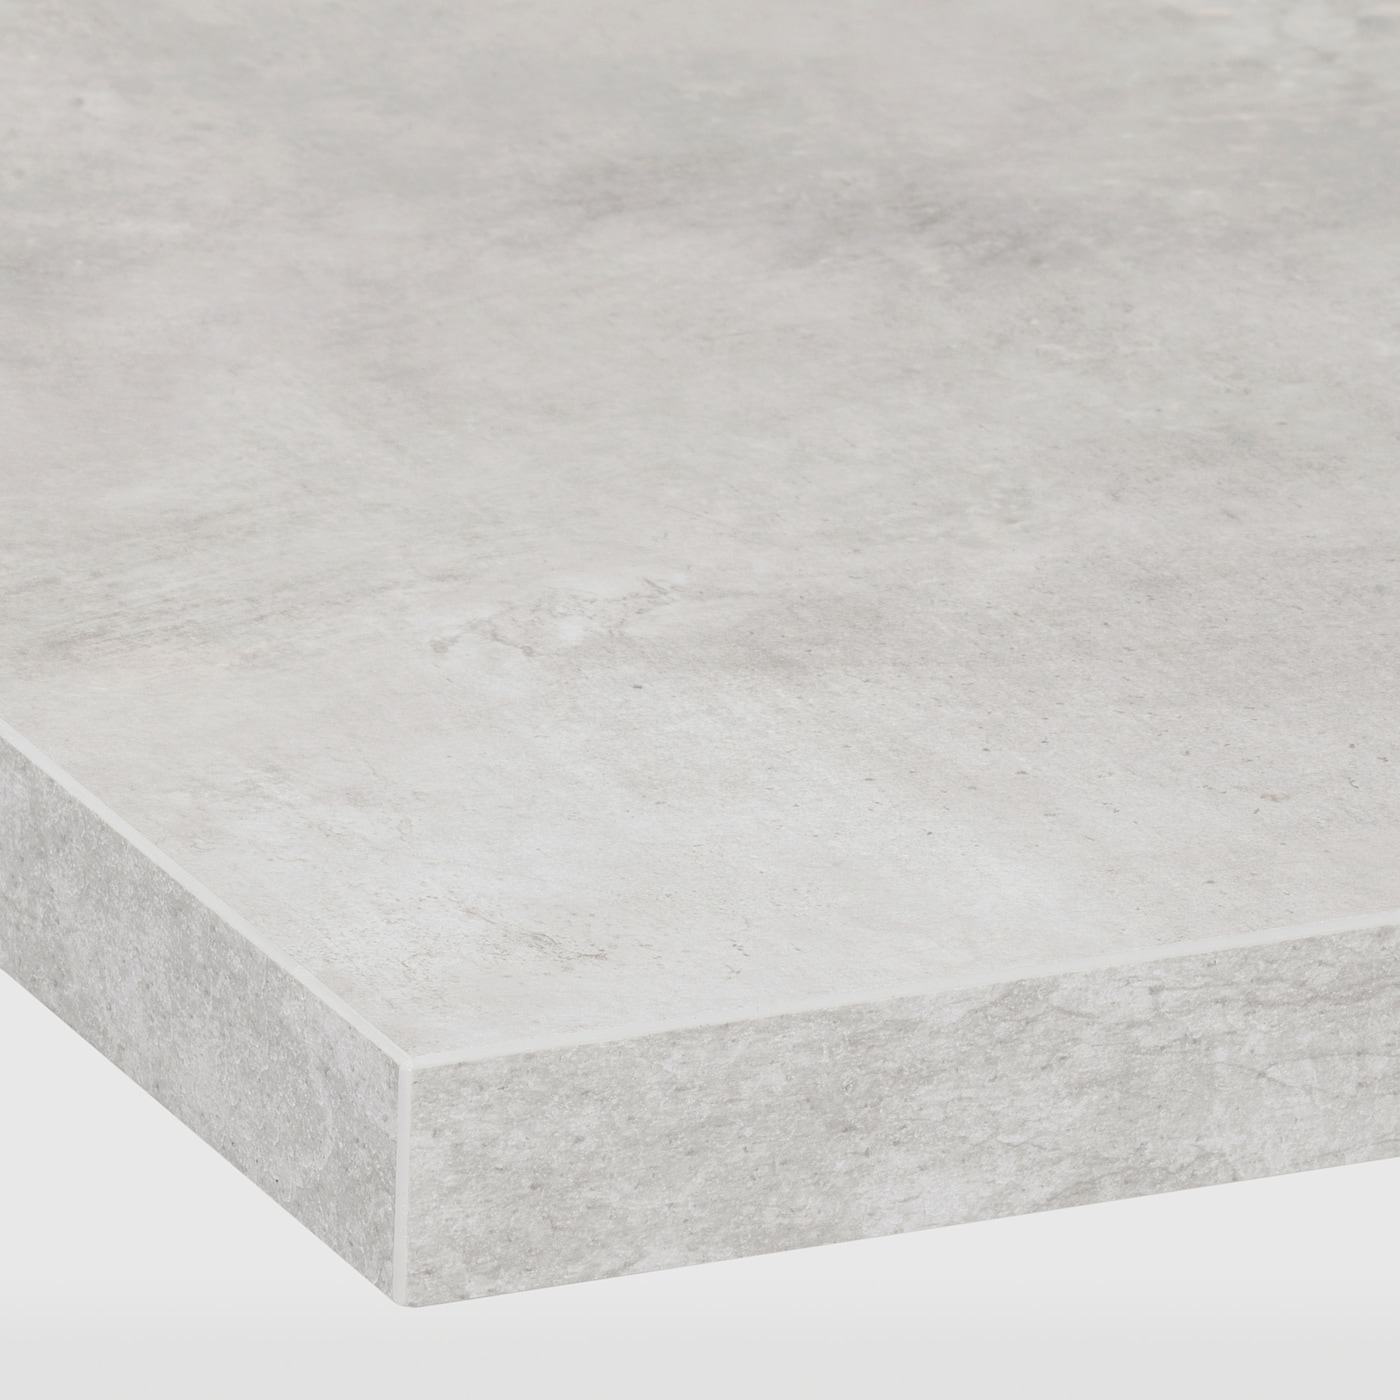 Ekbacken Light Grey Concrete Effect Laminate Worktop 186x2 8 Cm Ikea